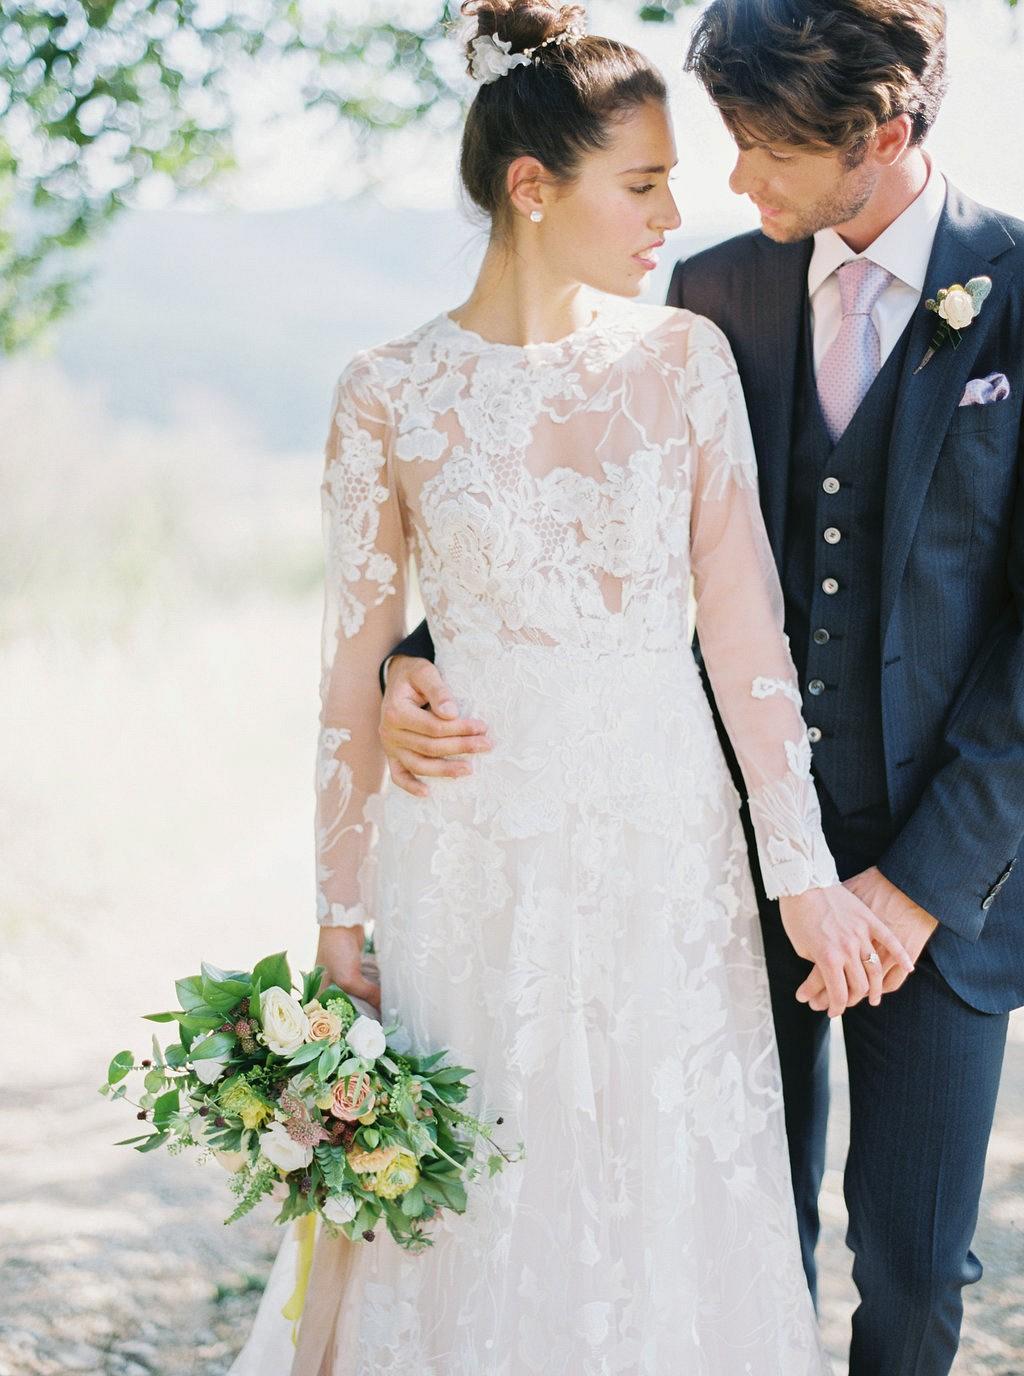 How to achieve that Italian Wedding Style